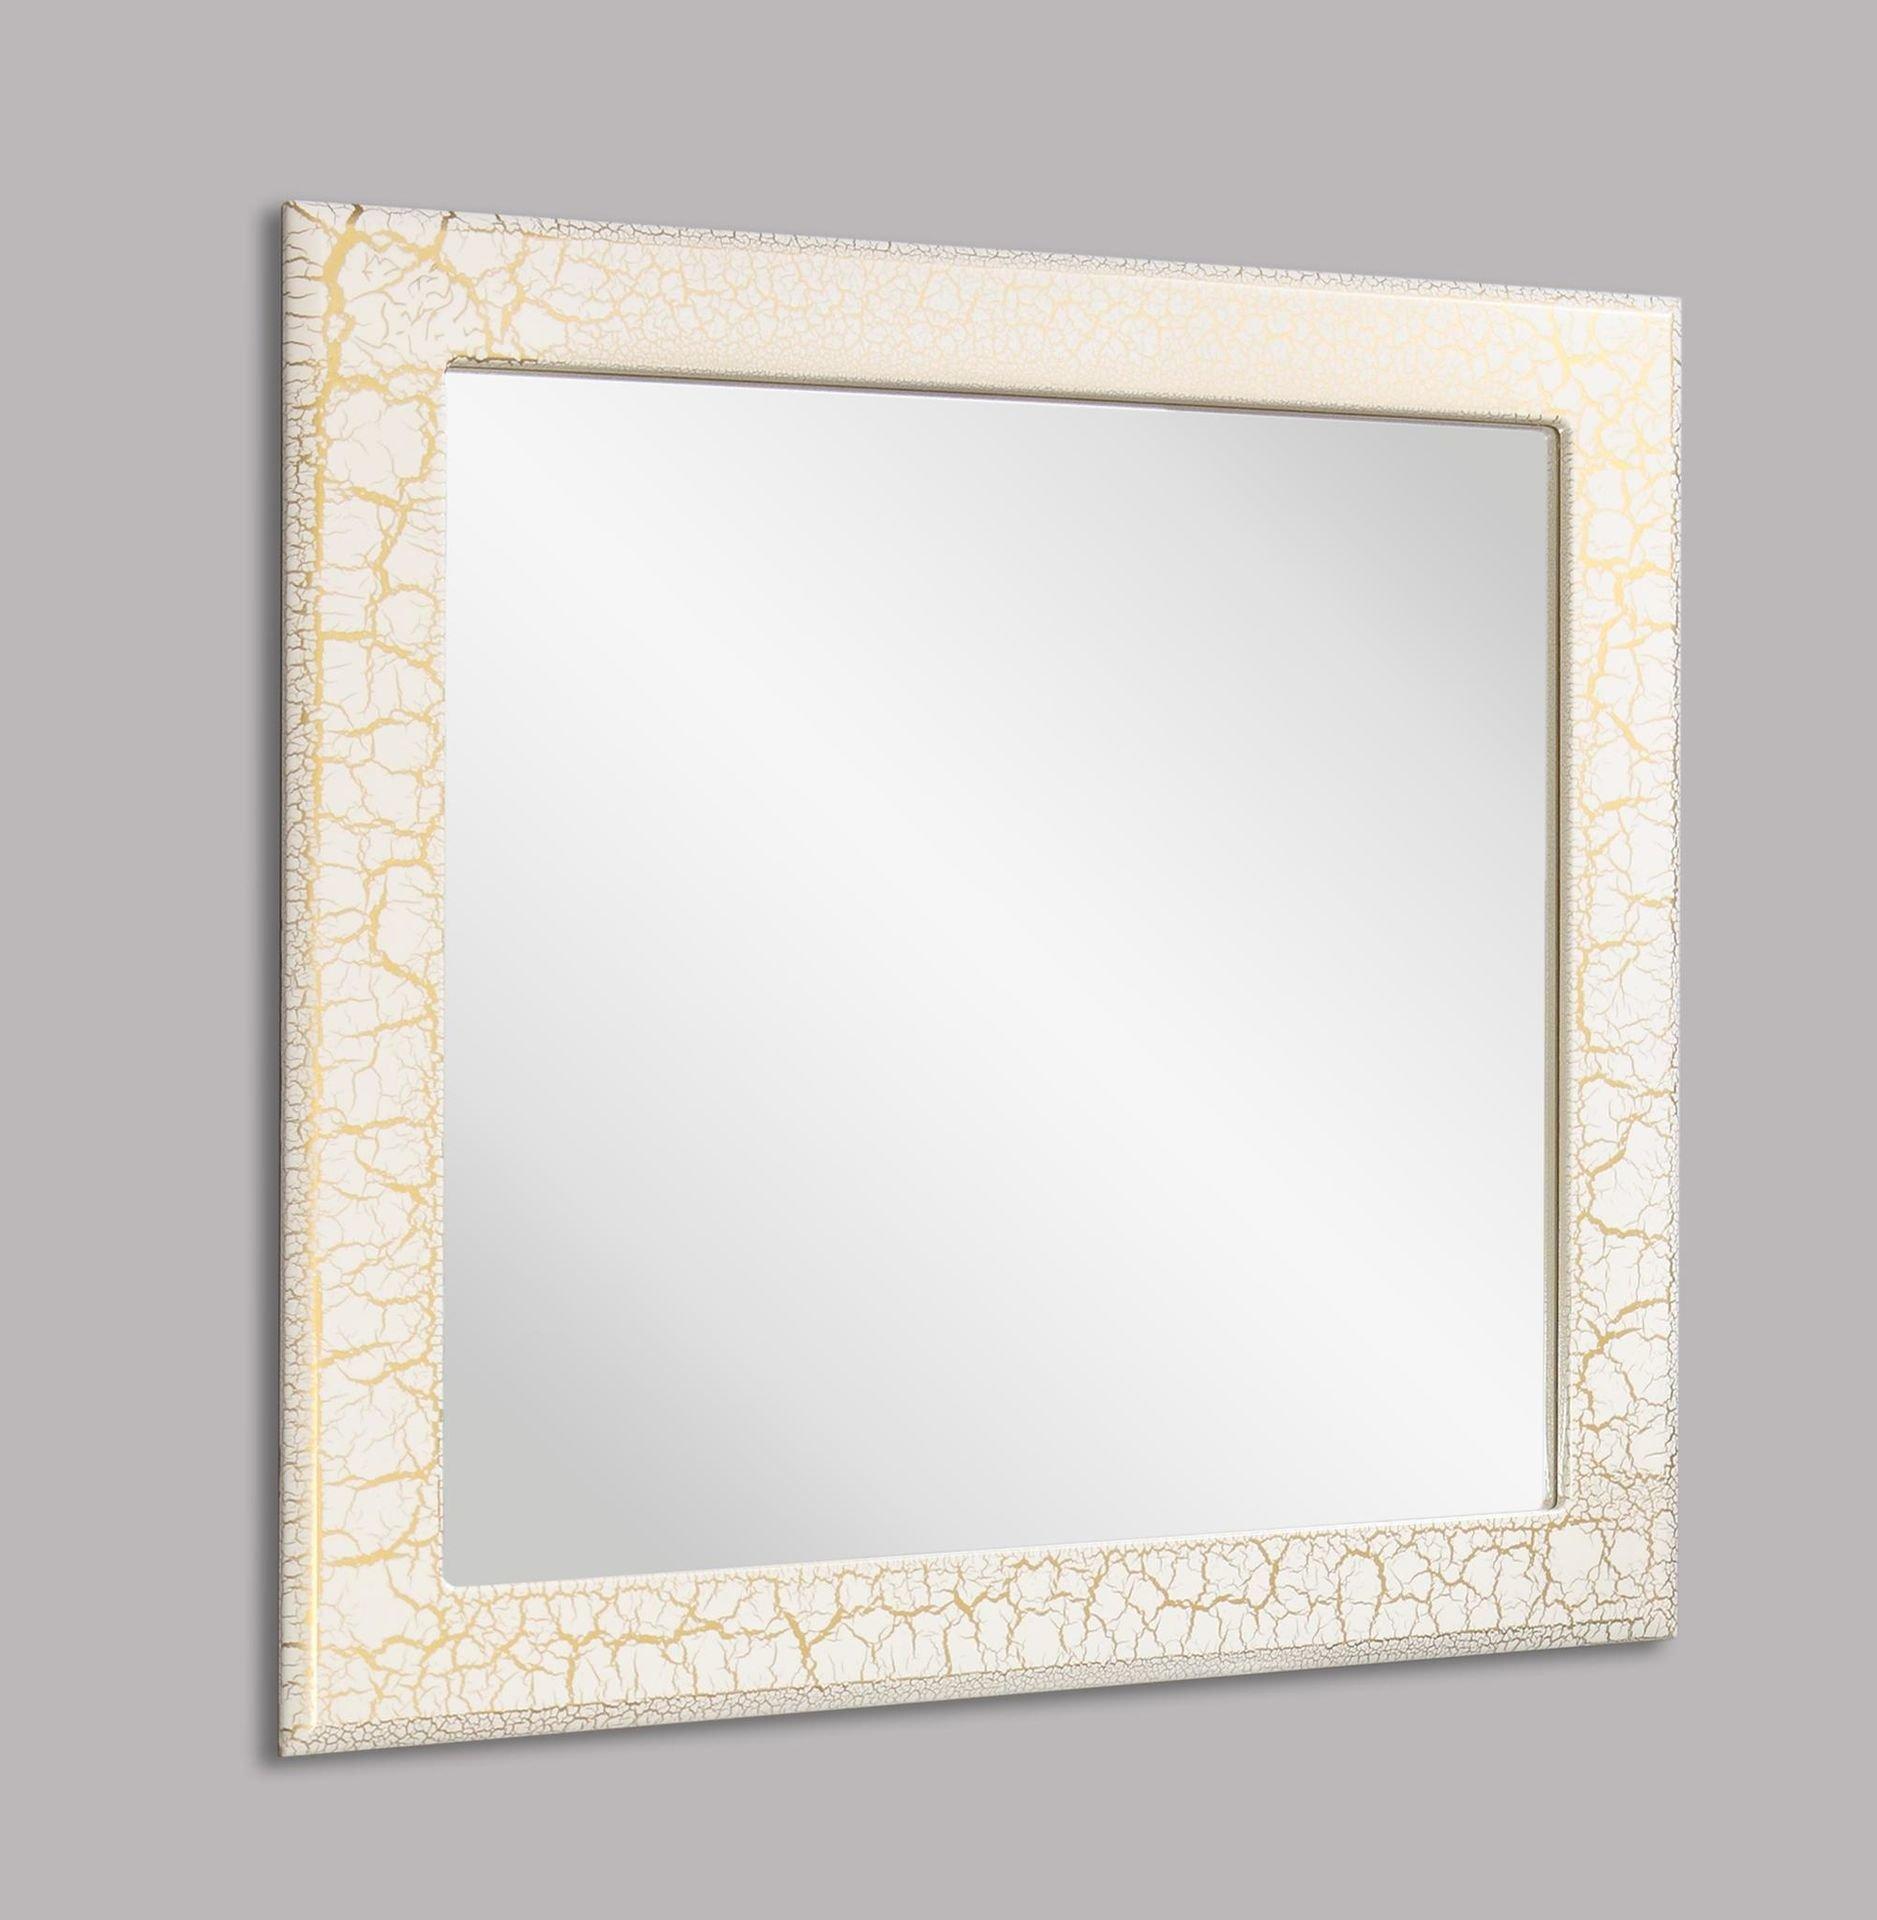 Зеркало НОРТА Терра 86 Белый/Золото 618